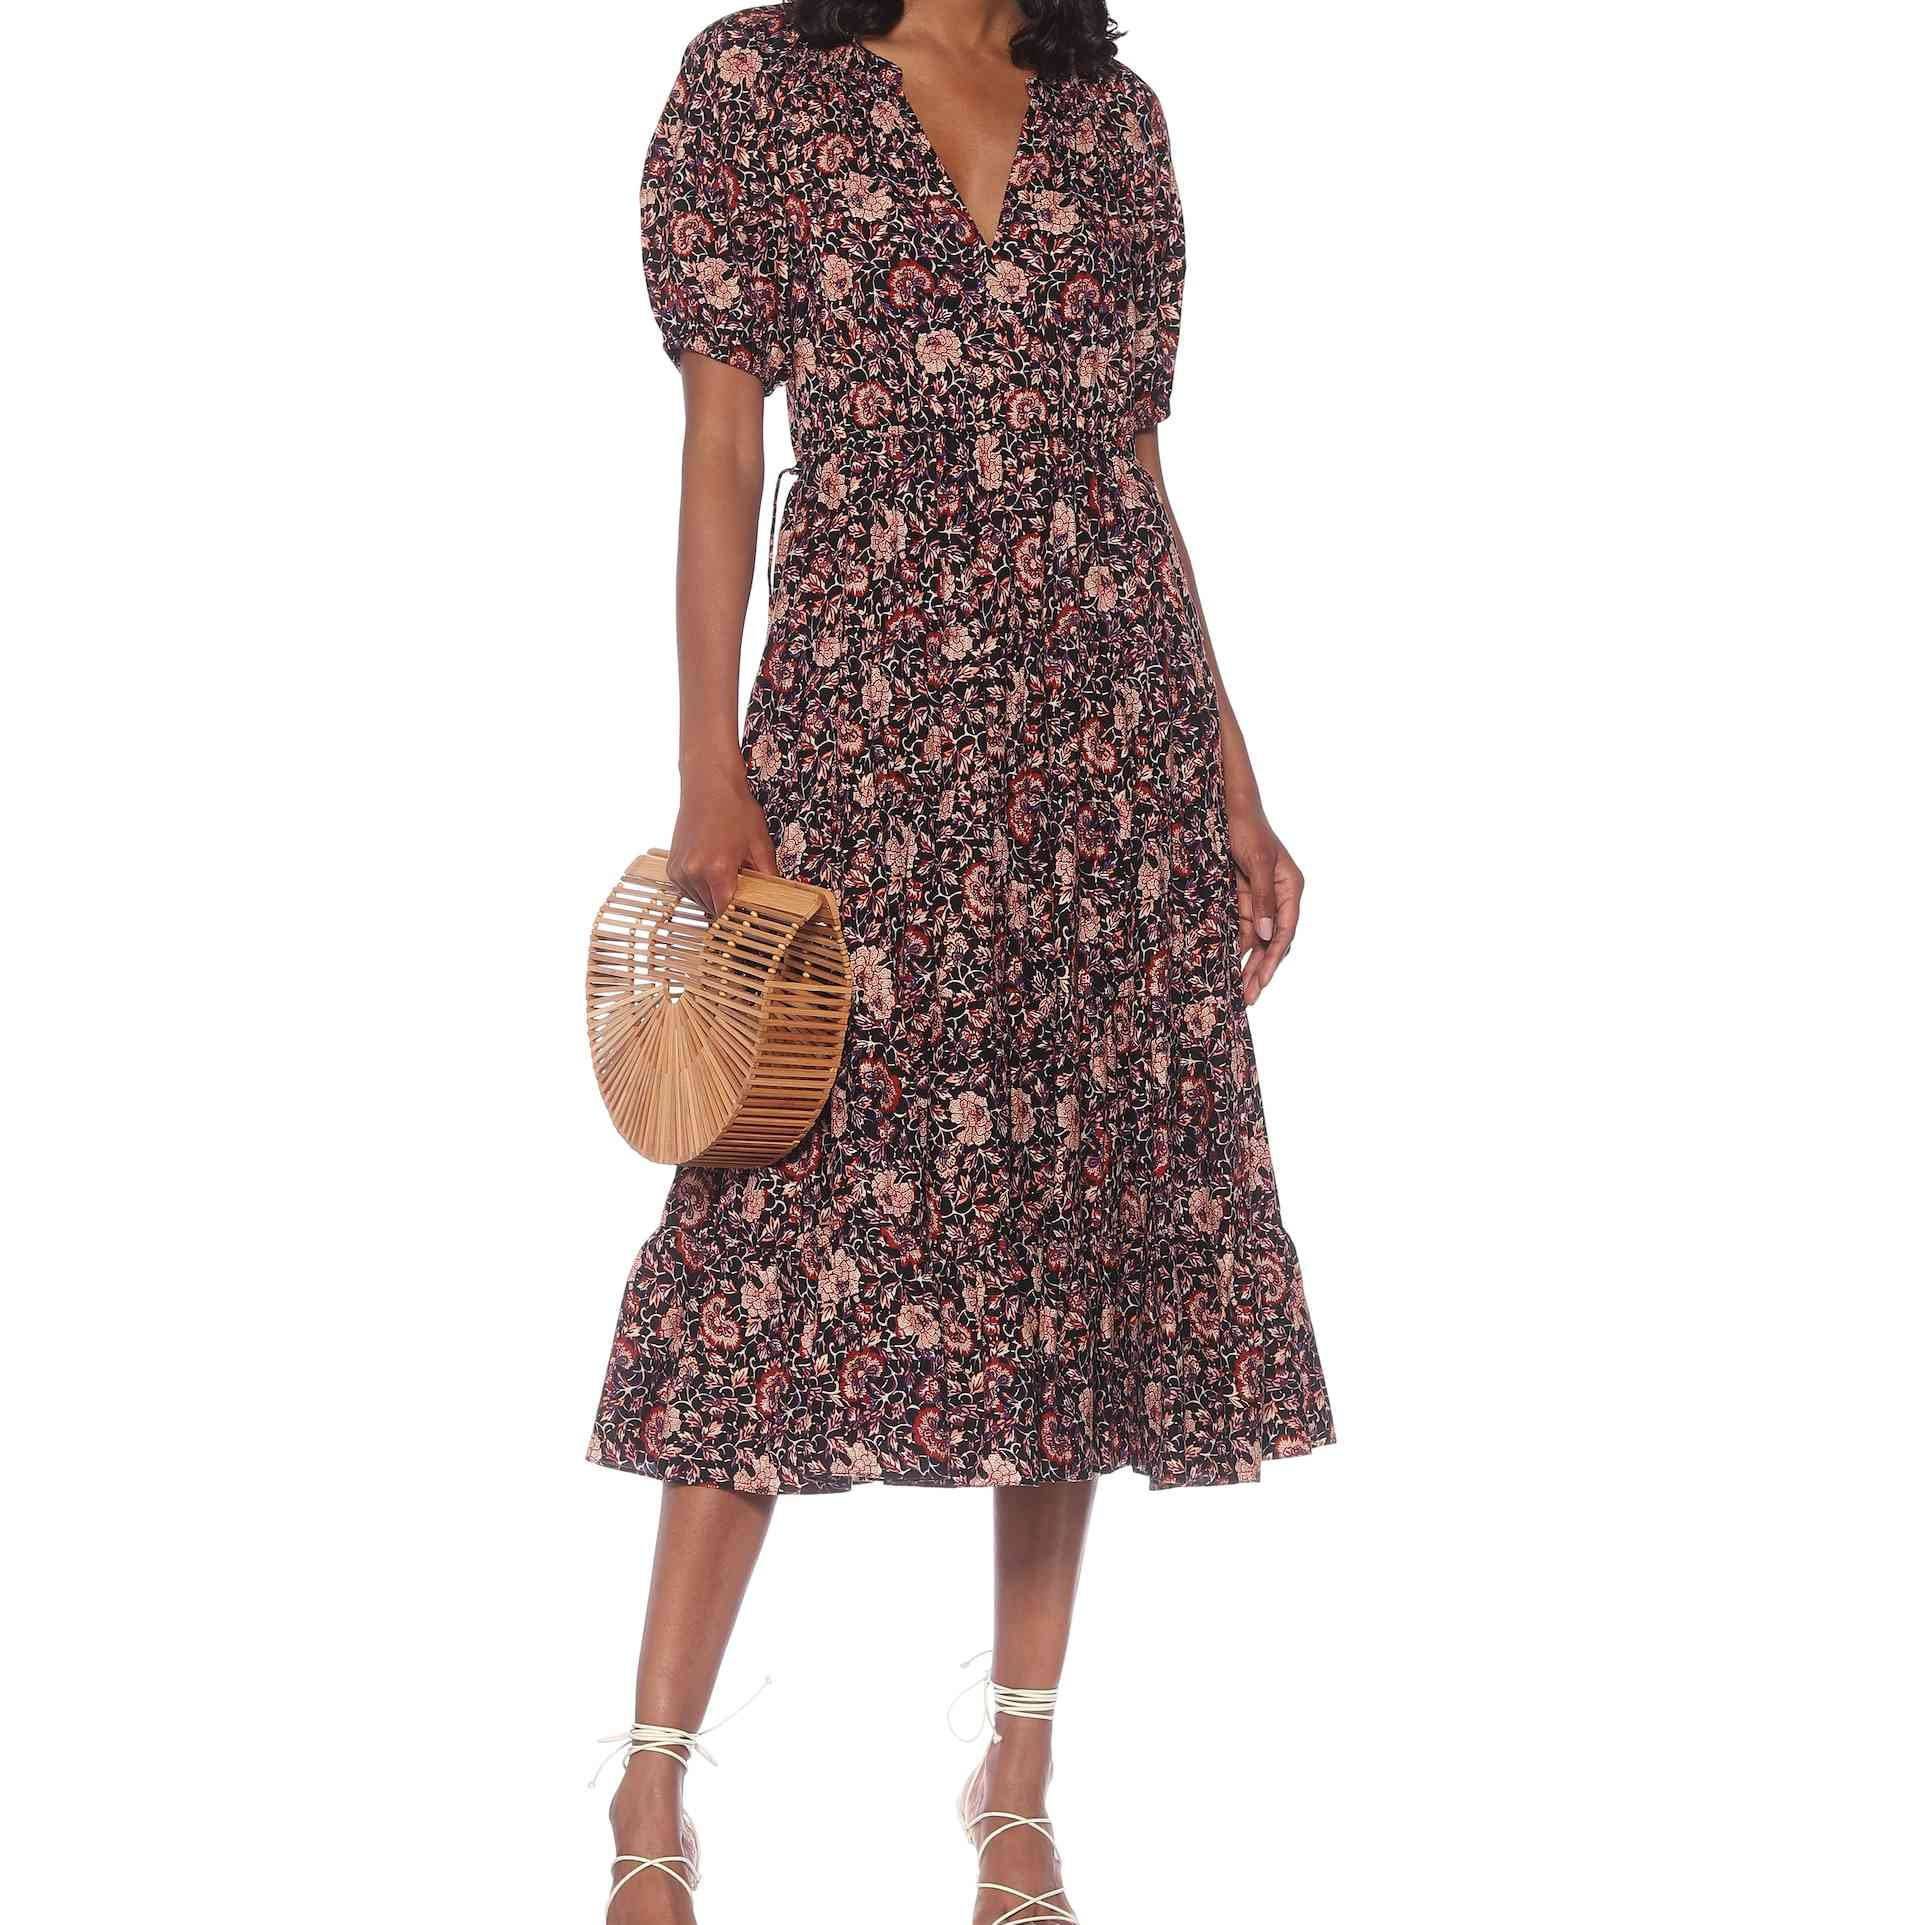 Ulla Johnson Claribel Cotton and Wool Midi Dress, $629